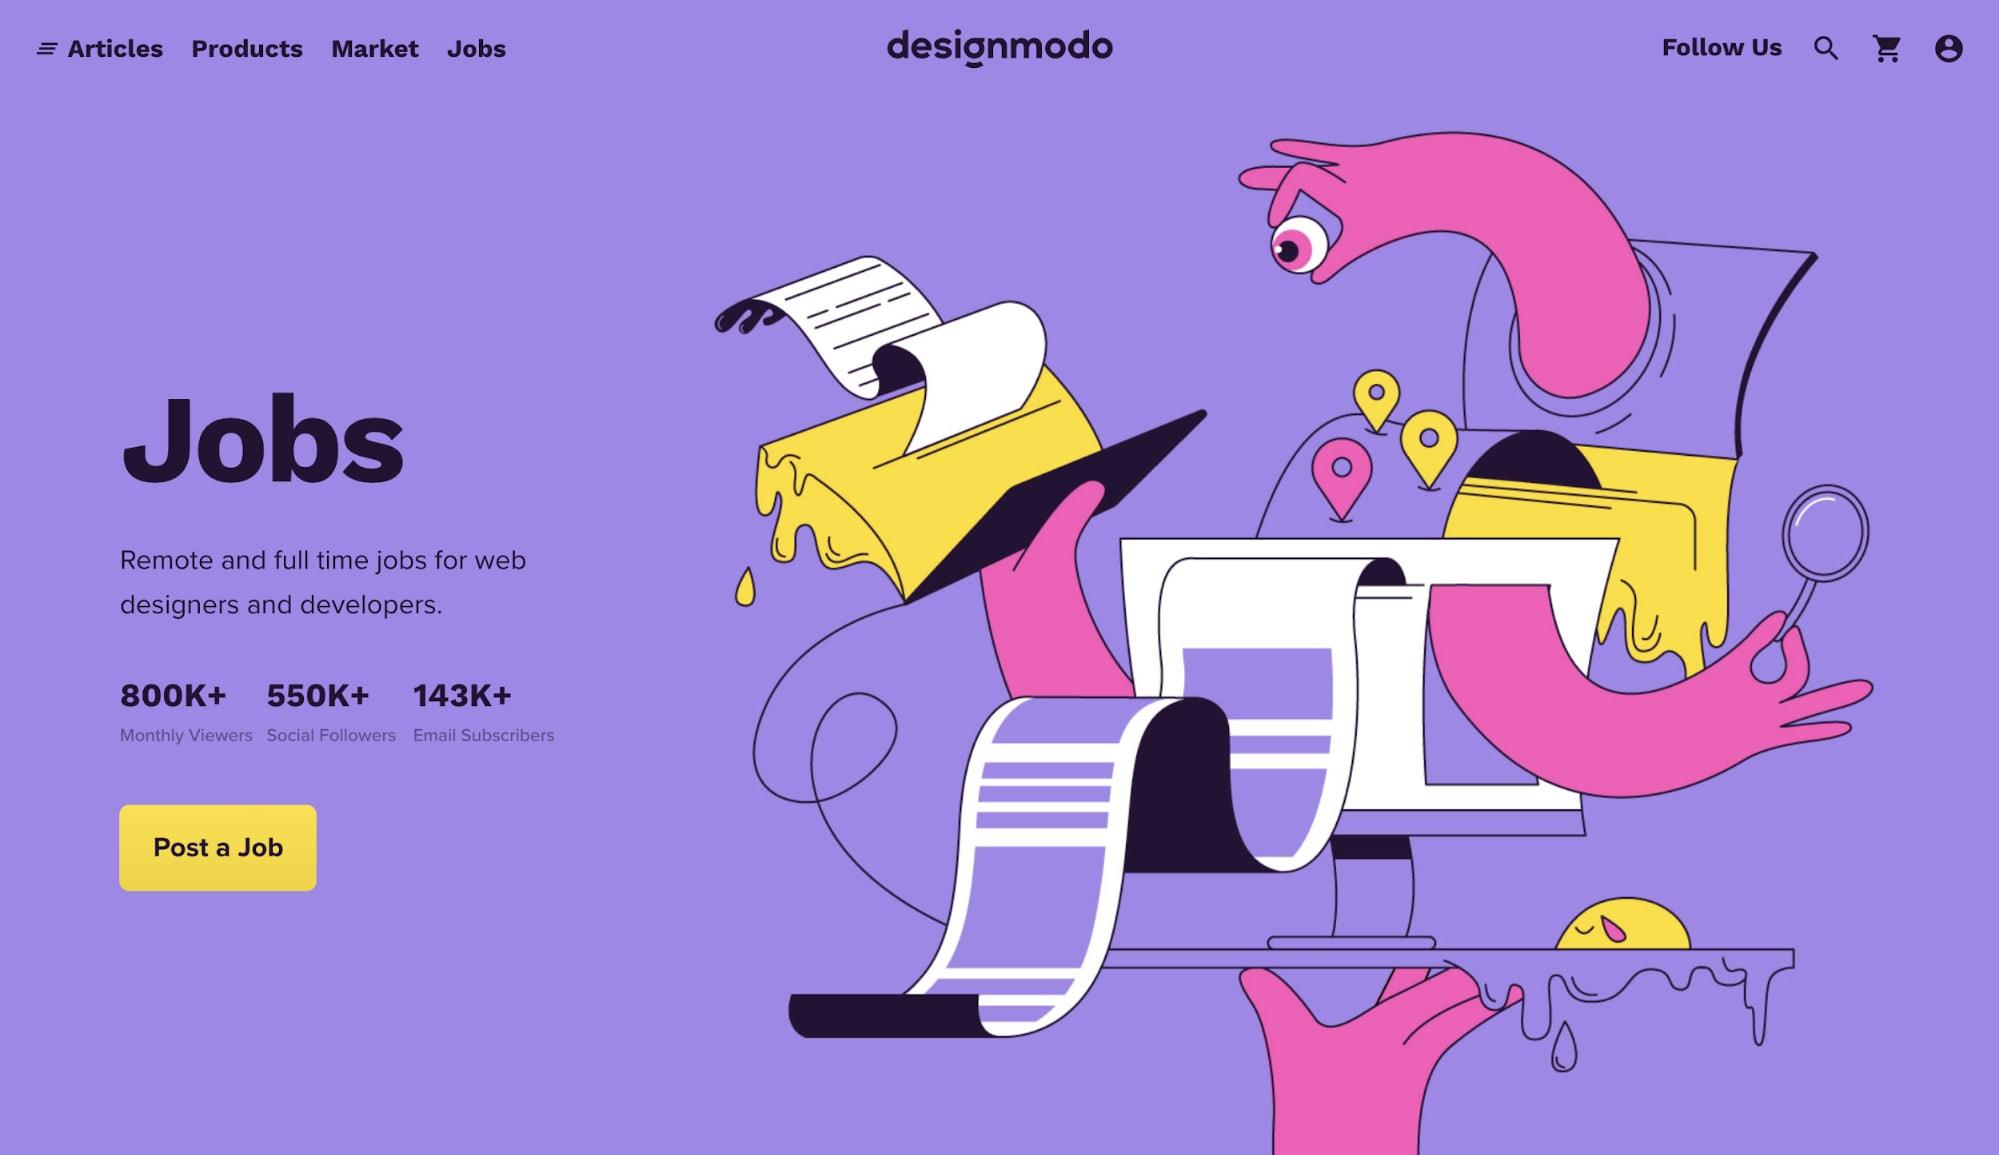 Designmodo Jobs